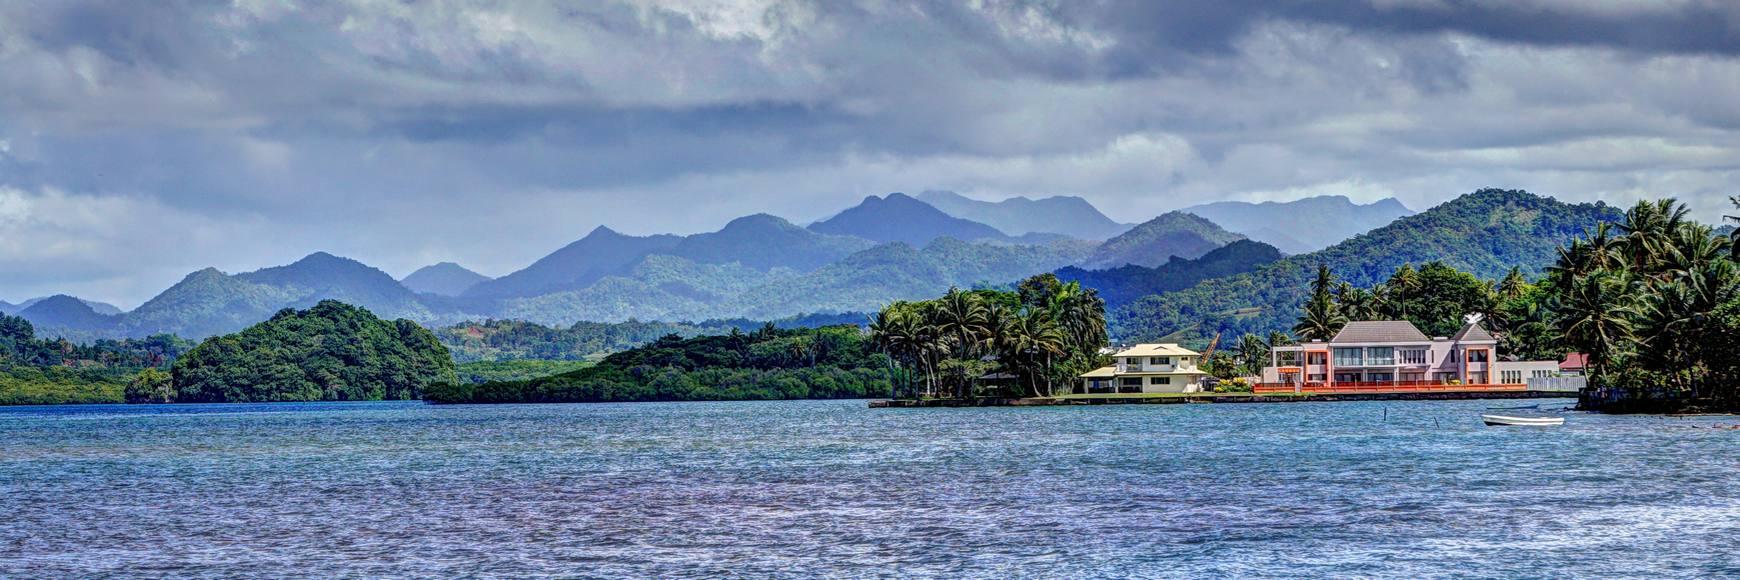 noleggio barca a vela Figi